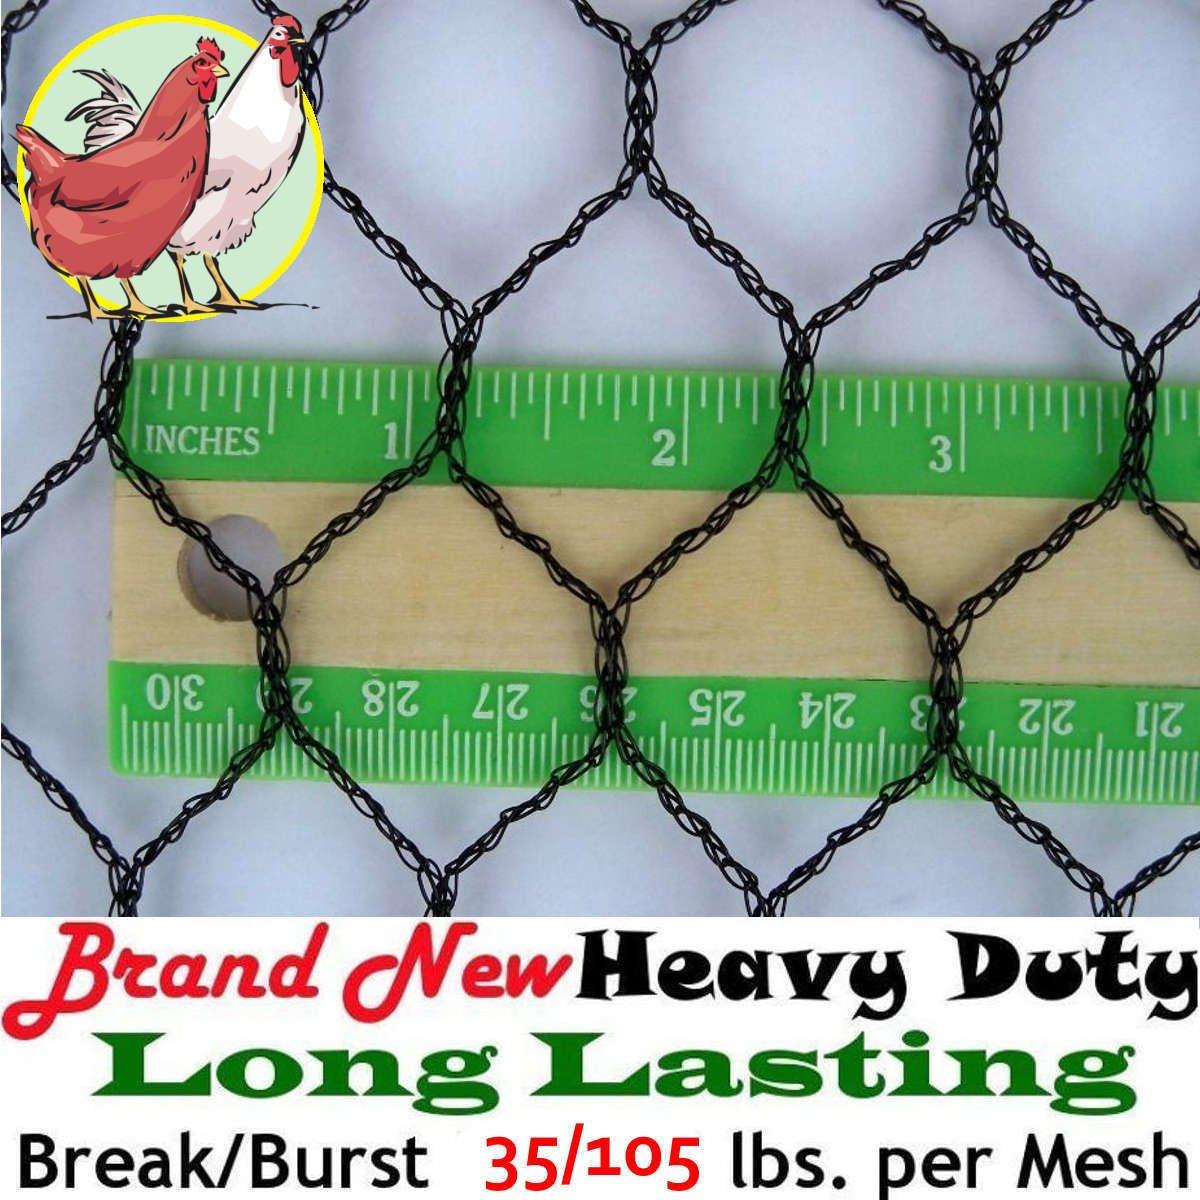 1'' Light Knitted Netting (12.5' X 200') Poultry Plant Bird Aviary Fruit Garden Protection Net Nets - Break/Burst: 35/105 lbs. per mesh by Pinnon Hatch Farms